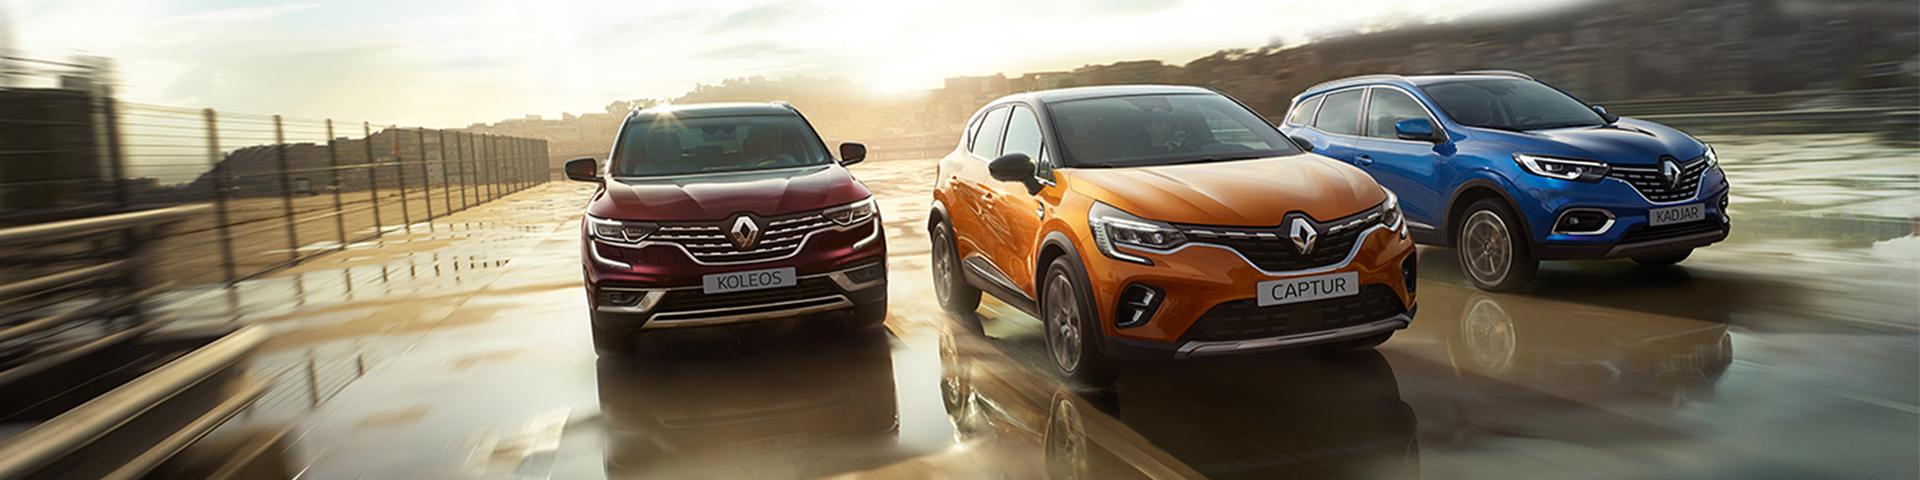 Renault SUV range 2020_1920x480 (slider naslovna)